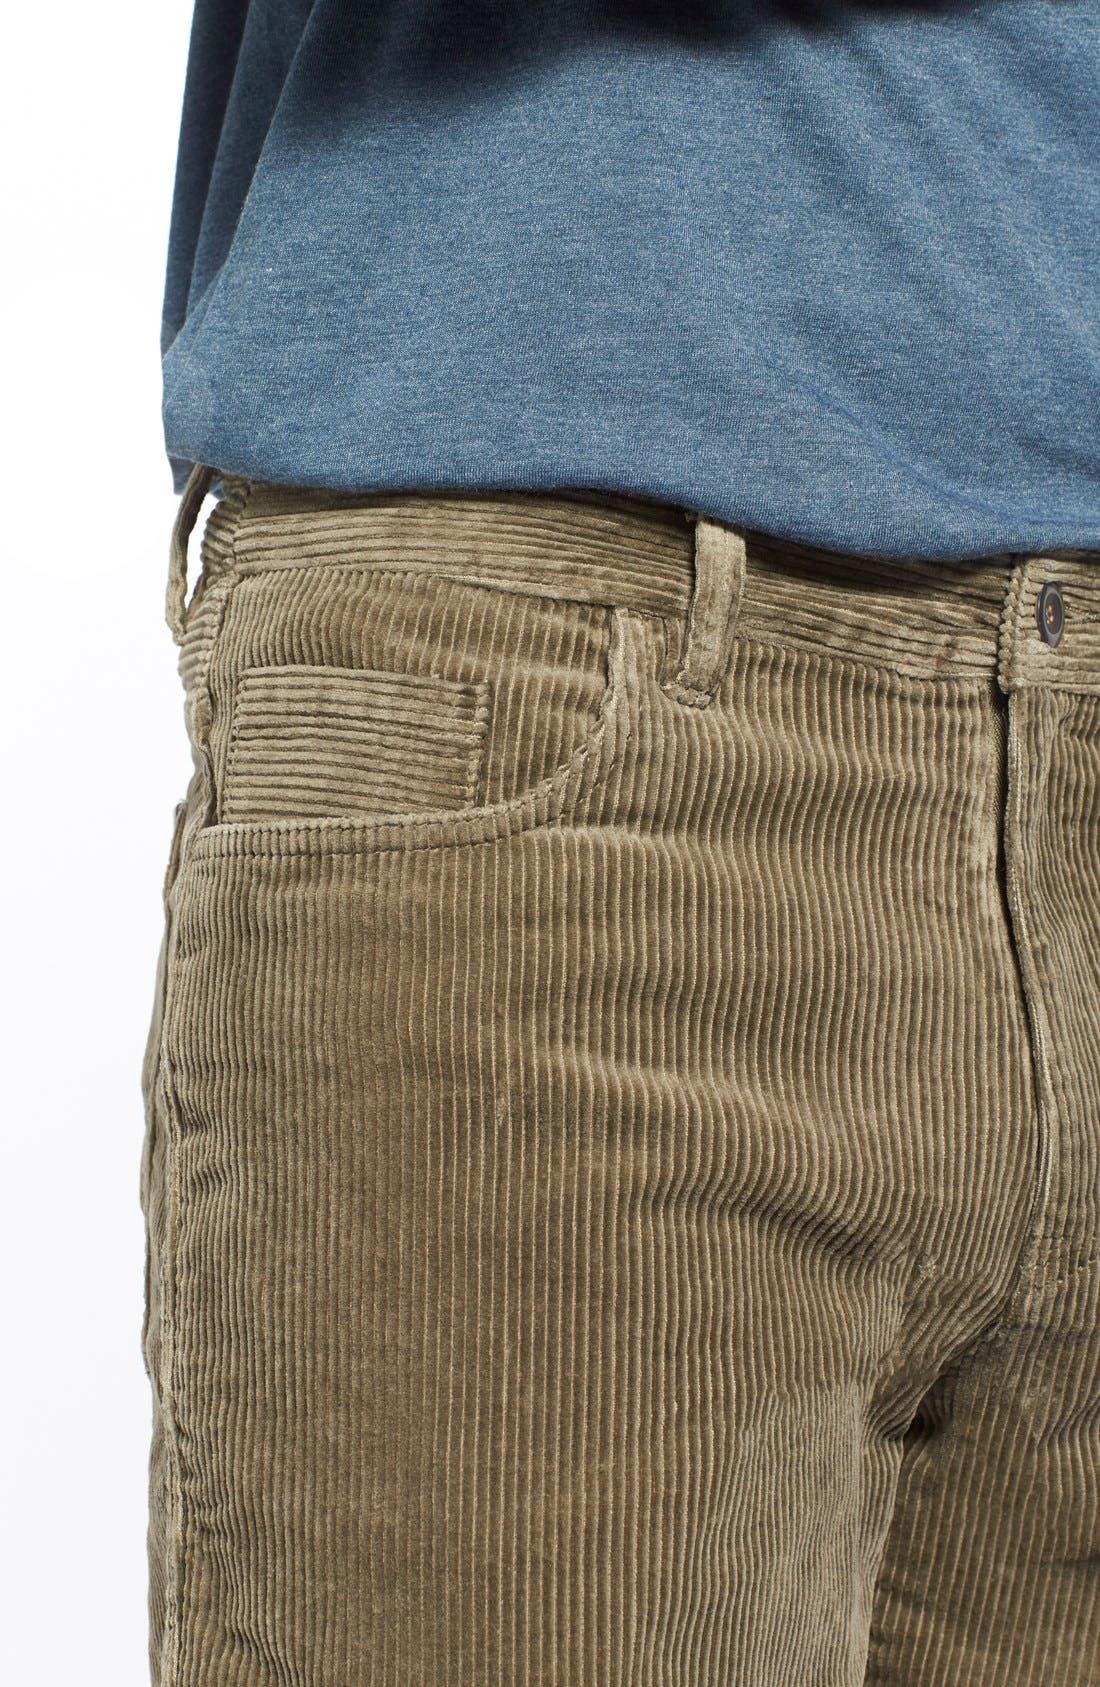 Kordo Corduroy Walking Shorts,                             Alternate thumbnail 7, color,